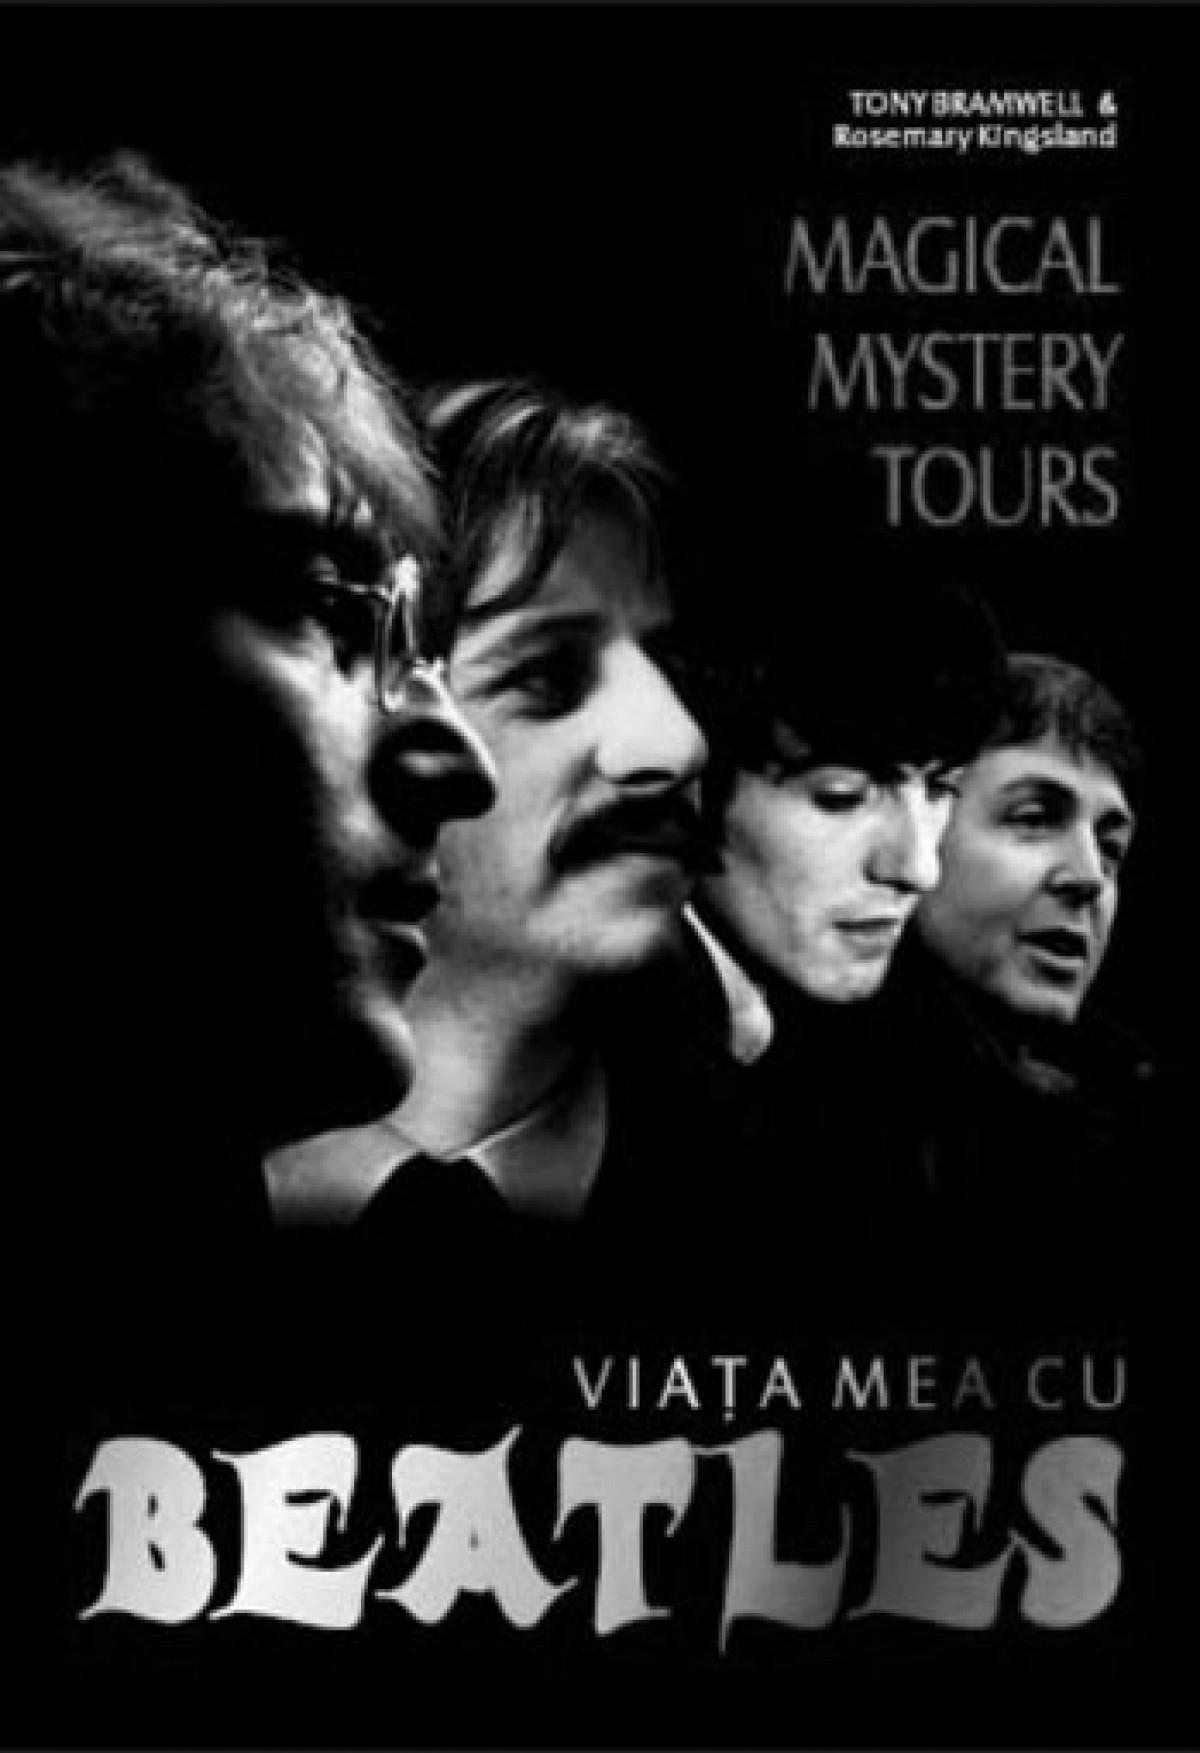 Magical Mistery Tours.Viata mea cu Beatles